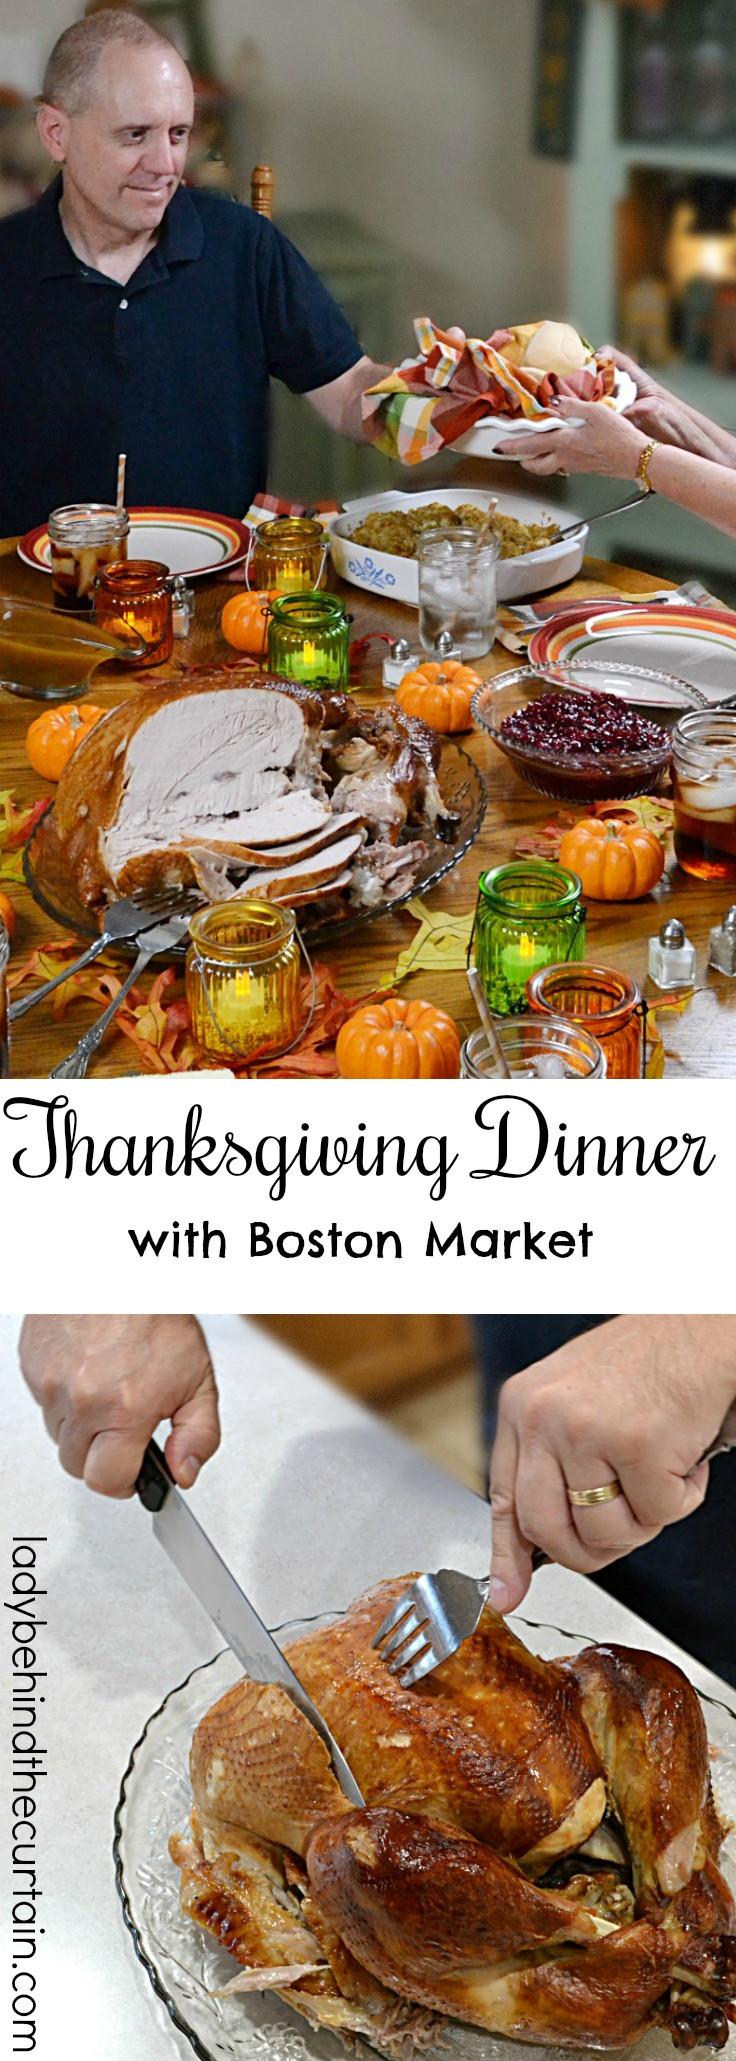 Boston Market Turkey Dinner Thanksgiving  Thanksgiving Dinner with Boston Market